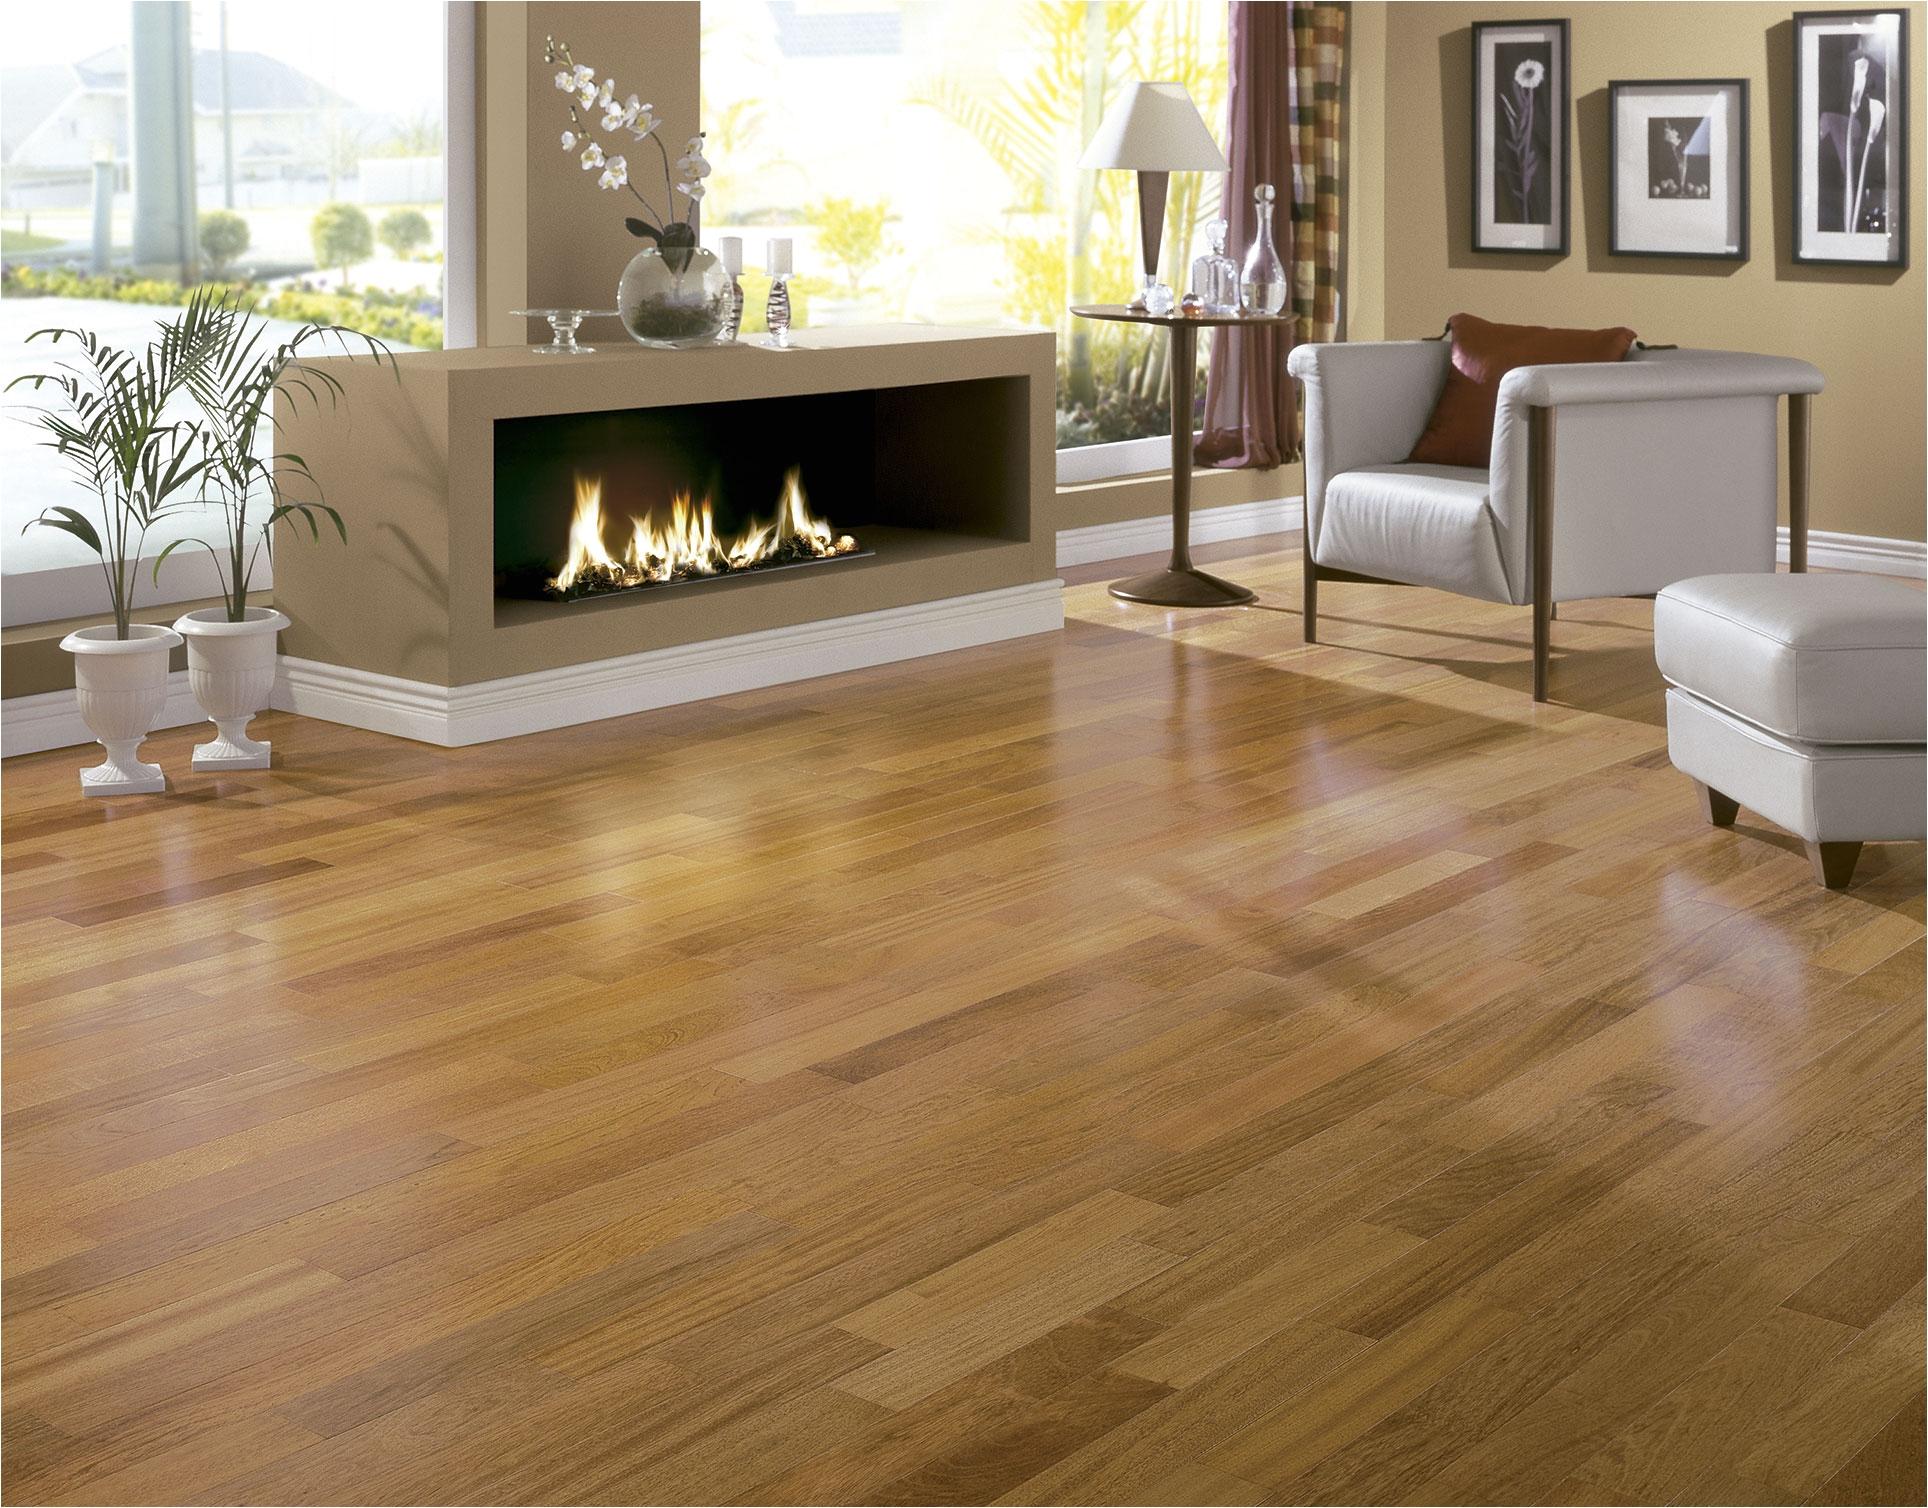 full size of bedroom cute discount hardwood flooring 6 brazilian cherry 1920x1508 discount hardwood flooring ohio